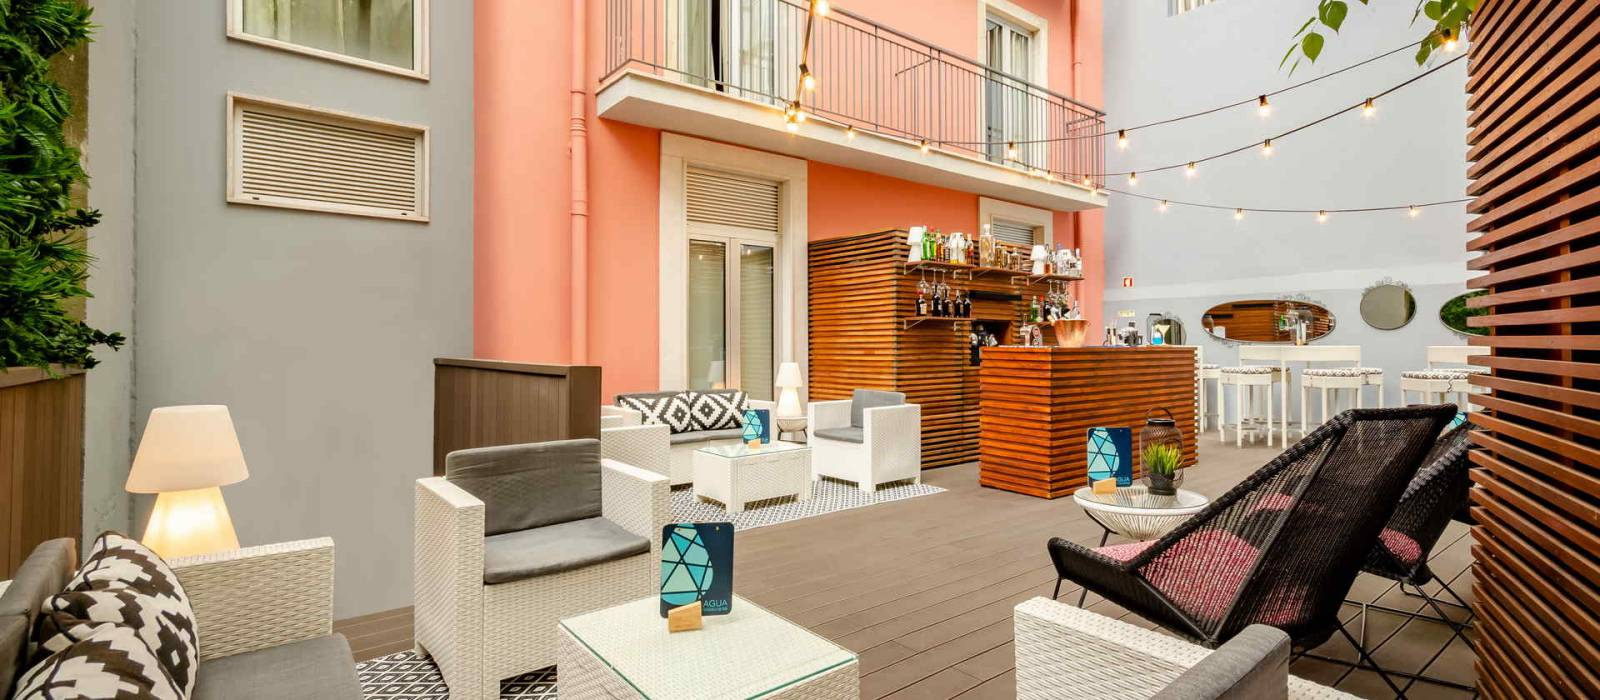 Terrace Ar Bar - Vincci Liberdade